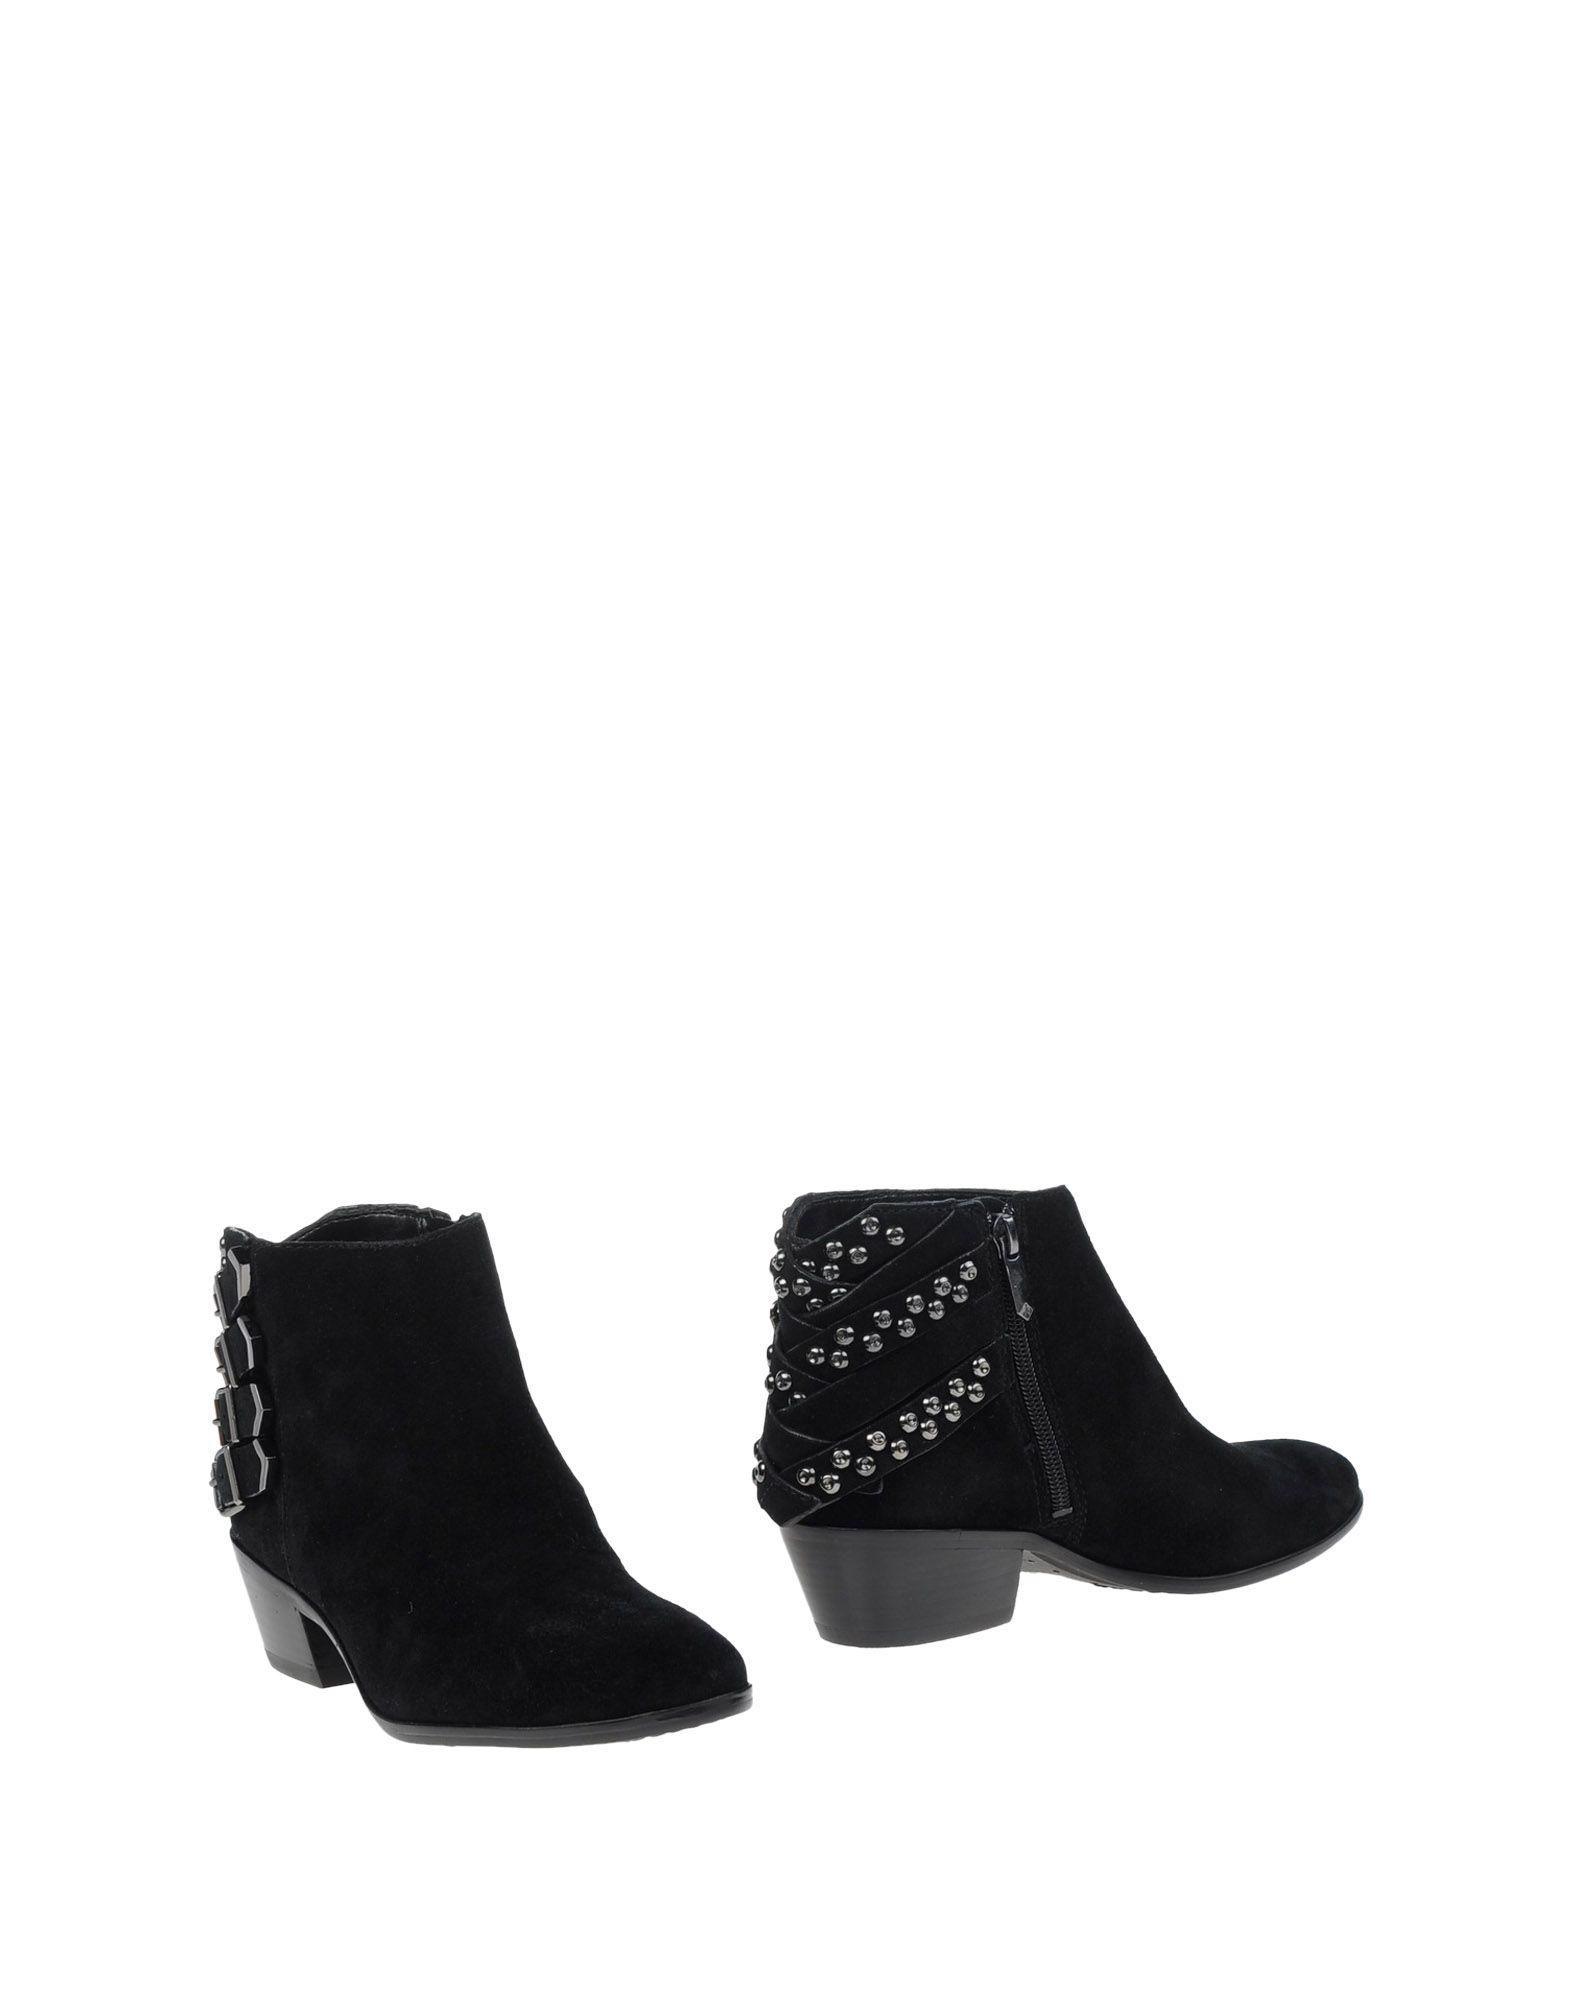 sam edelman embellished suede ankle boots in black lyst